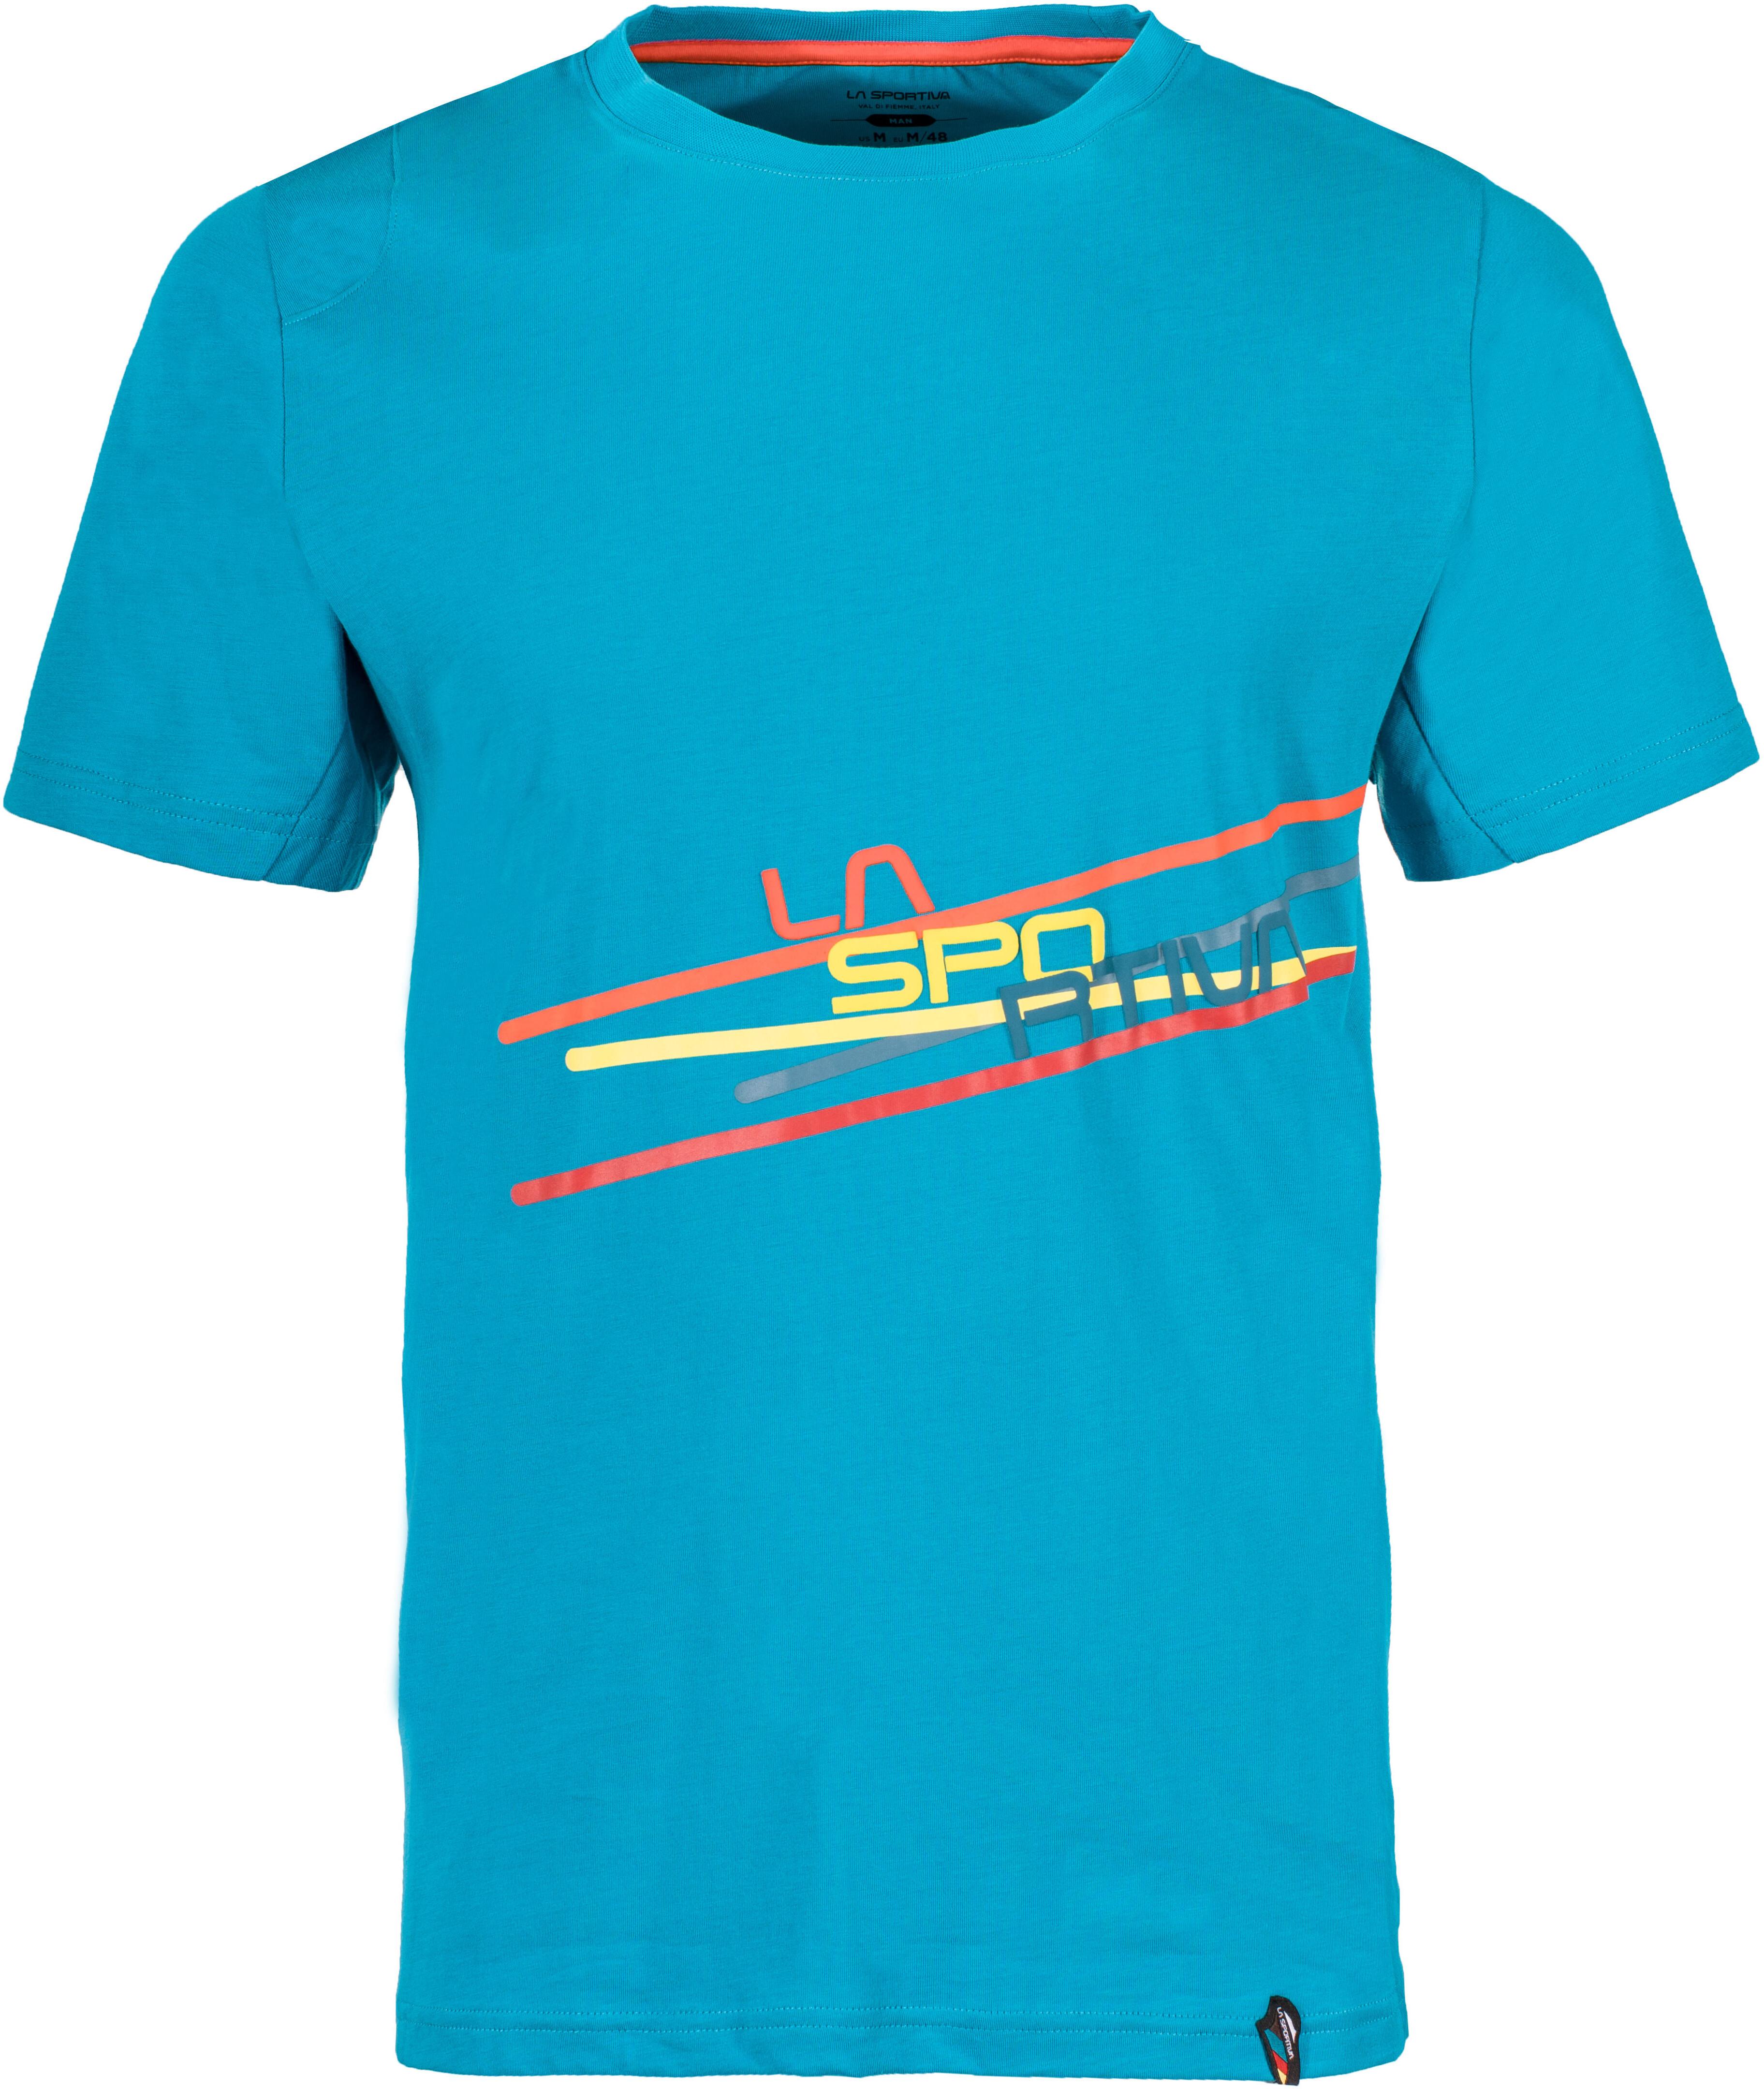 2469f68eb509a La Sportiva Stripe 2.0 - Camiseta manga corta Hombre - azul